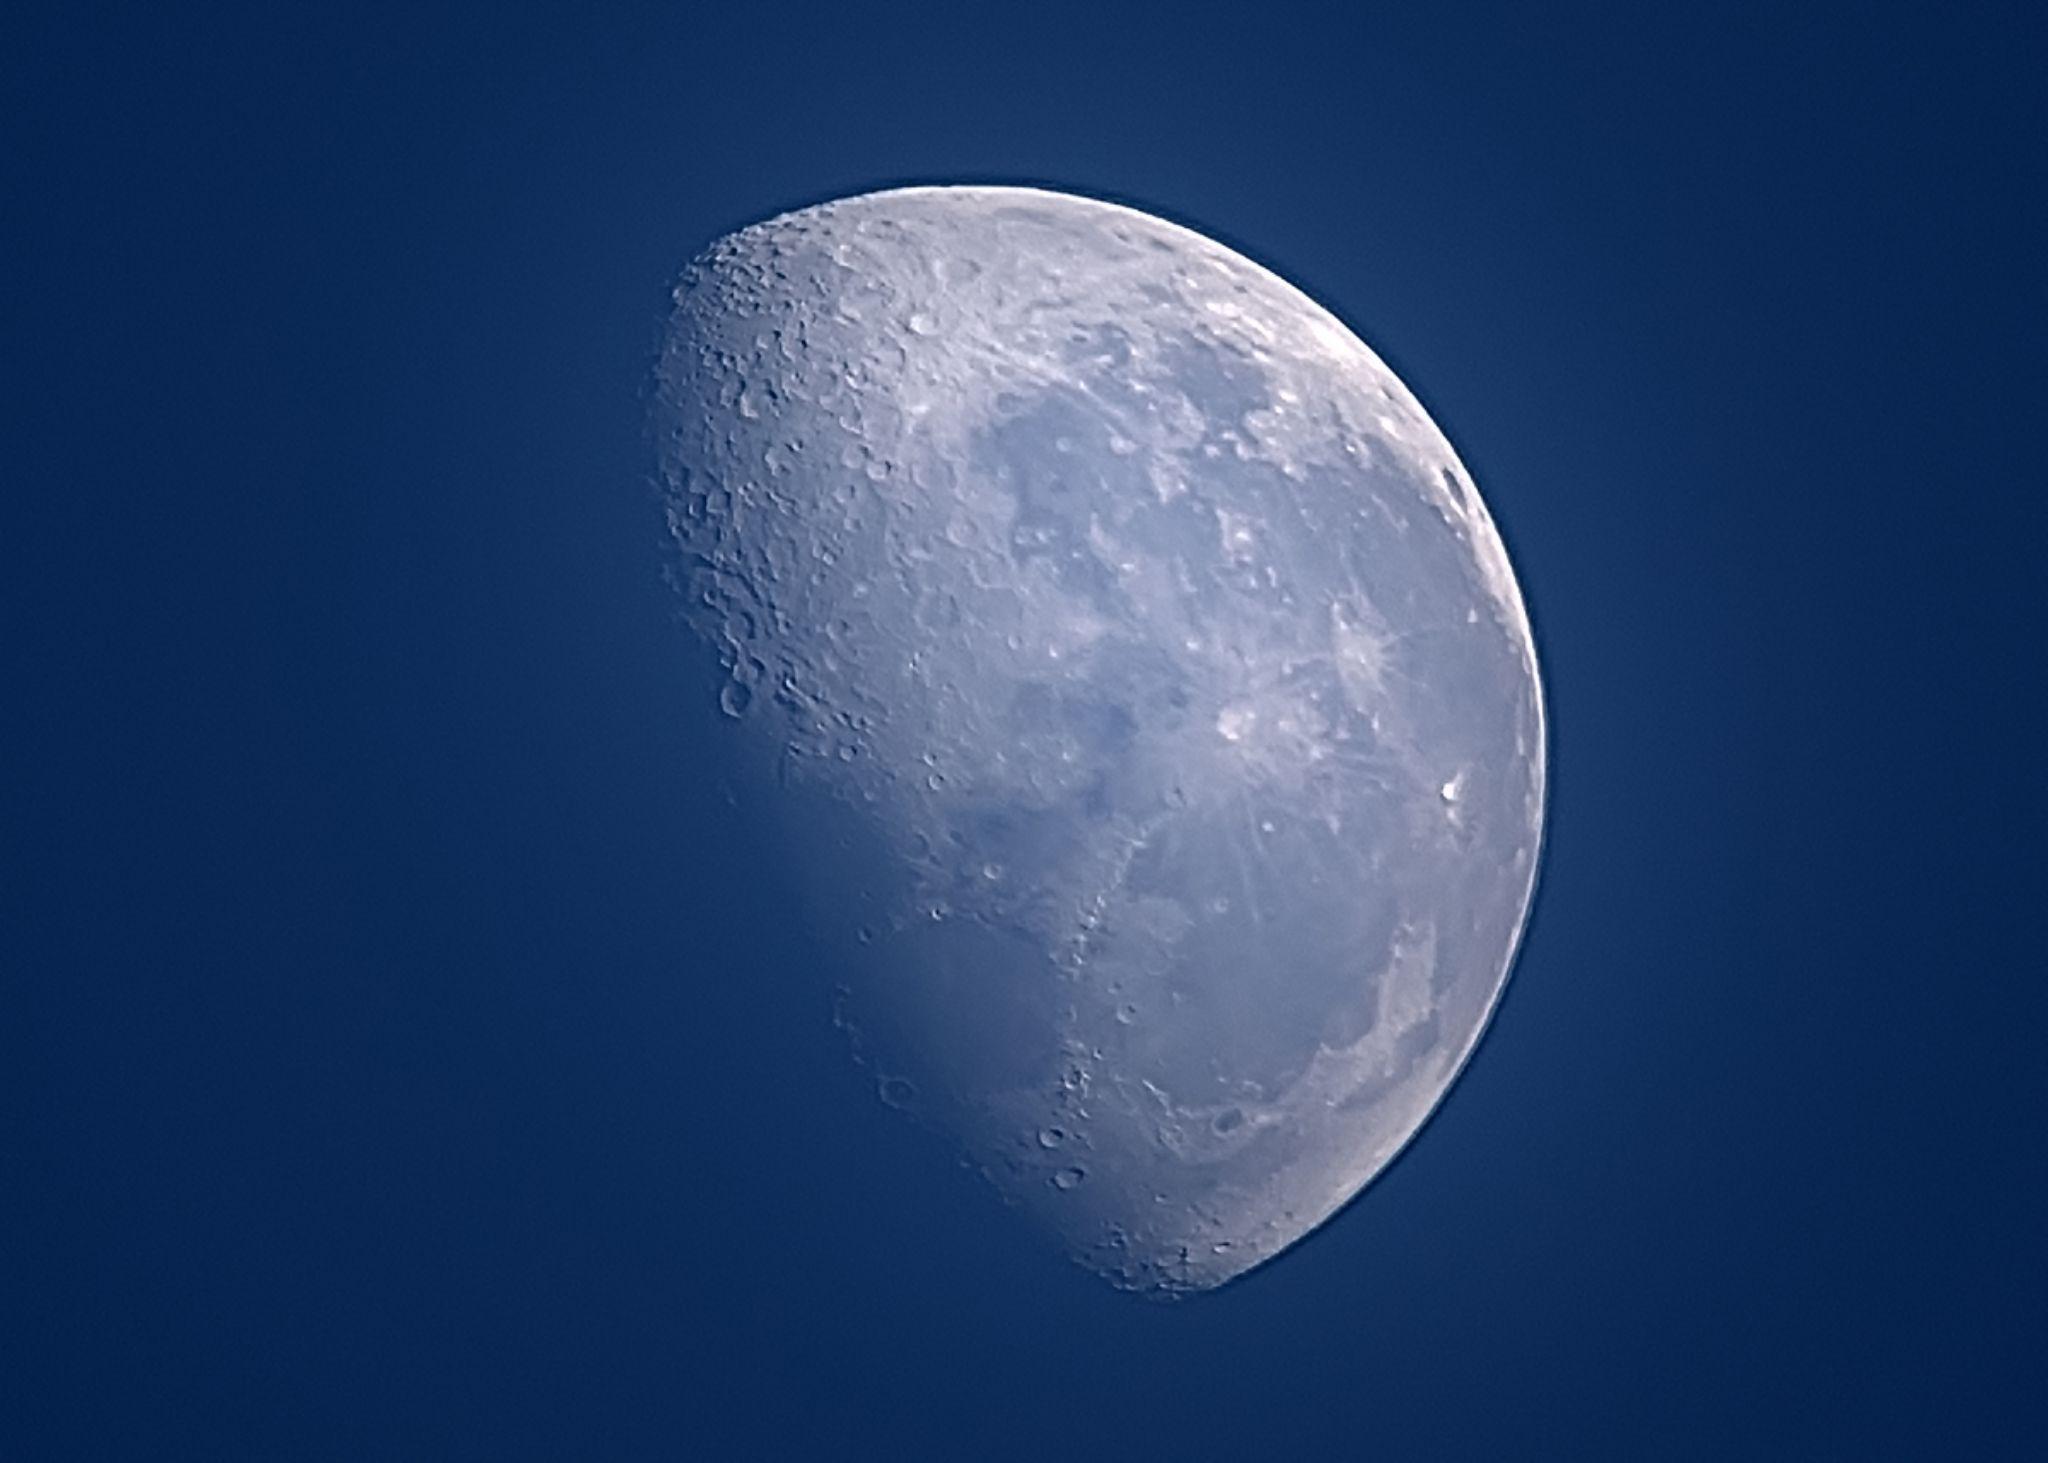 Blue Moon,close up by lendames